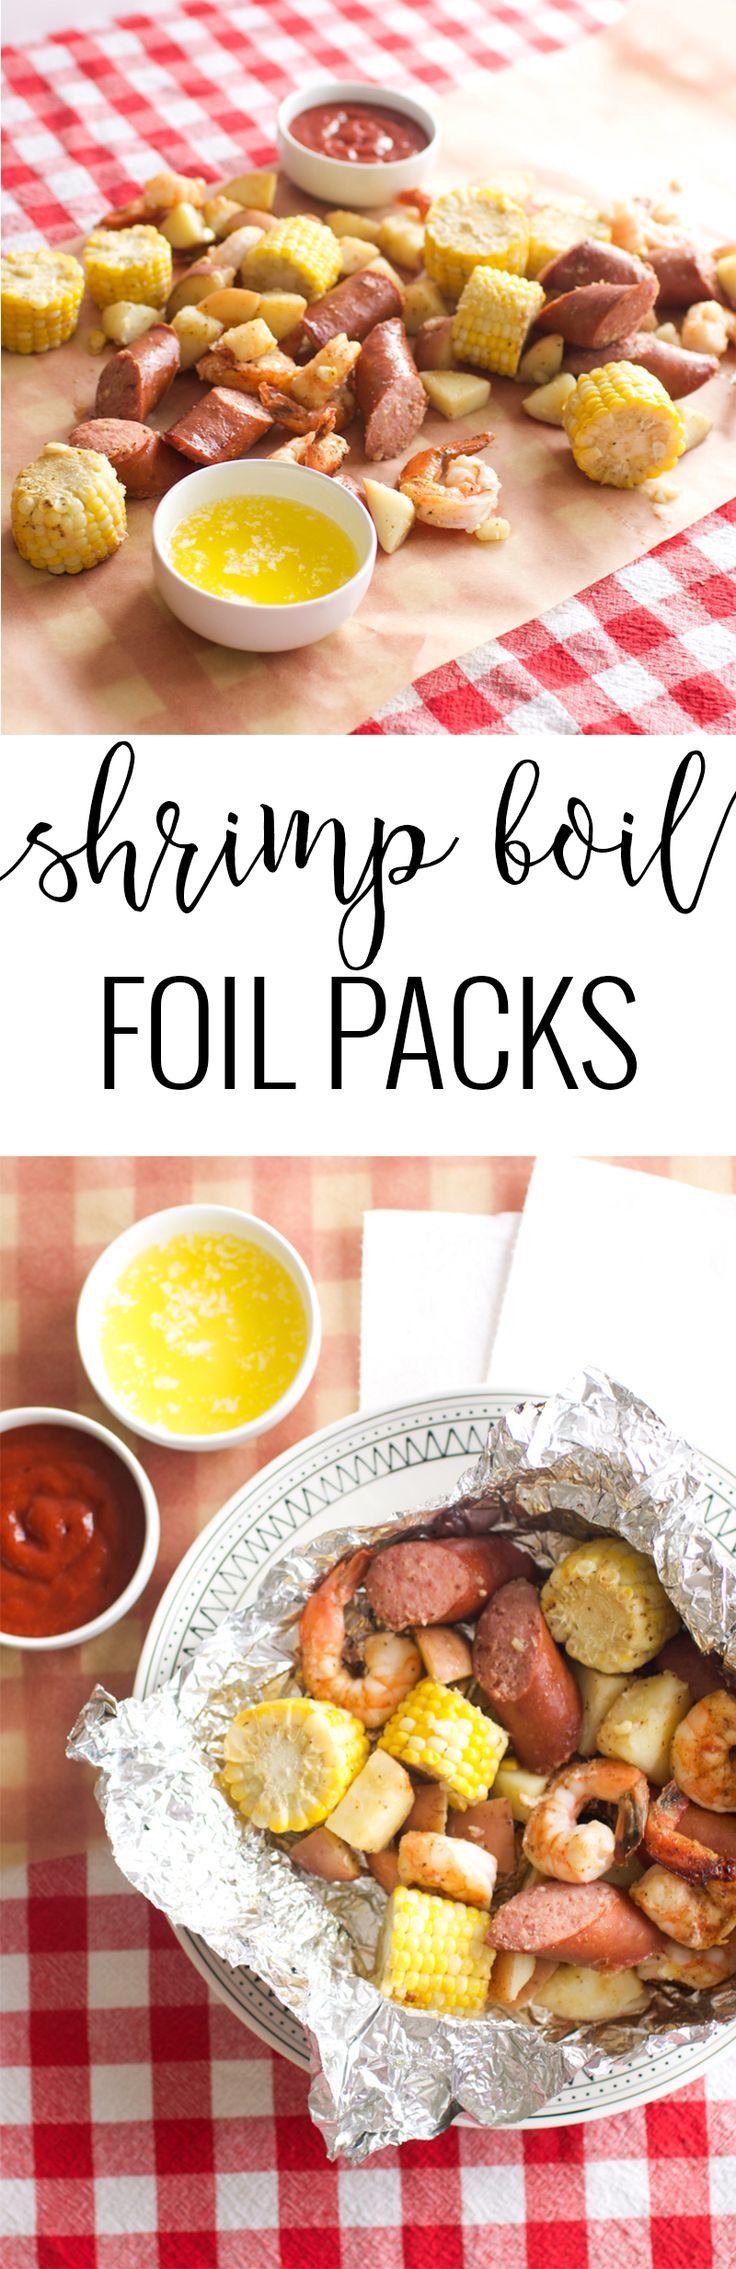 Shrimp Boil Foil Packs | foil packet meals | shrimp boil dinner ideas | easy shrimp boil recipes | foil dinner recipes | summer dinner recipes | homemade shrimp recipes | homemade summer recipe ideas | shrimp boil recipe ideas || Oh So Delicioso